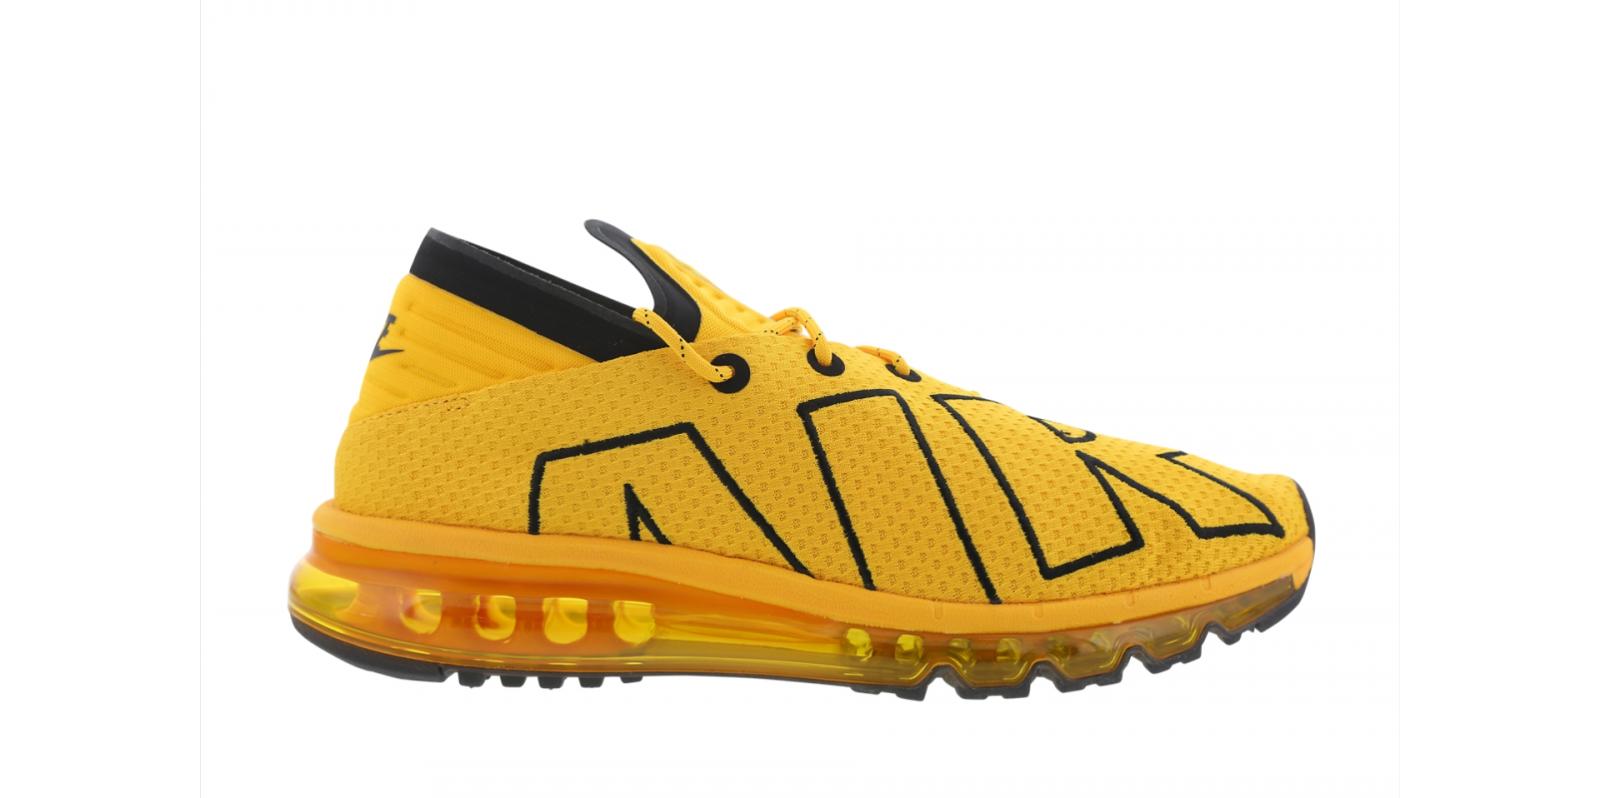 Hombre nike air max FLAIR 700 Universidad zapatillas doradas 942236 700 FLAIR Precio de temporada corta, beneficios de descuentos 3205c9